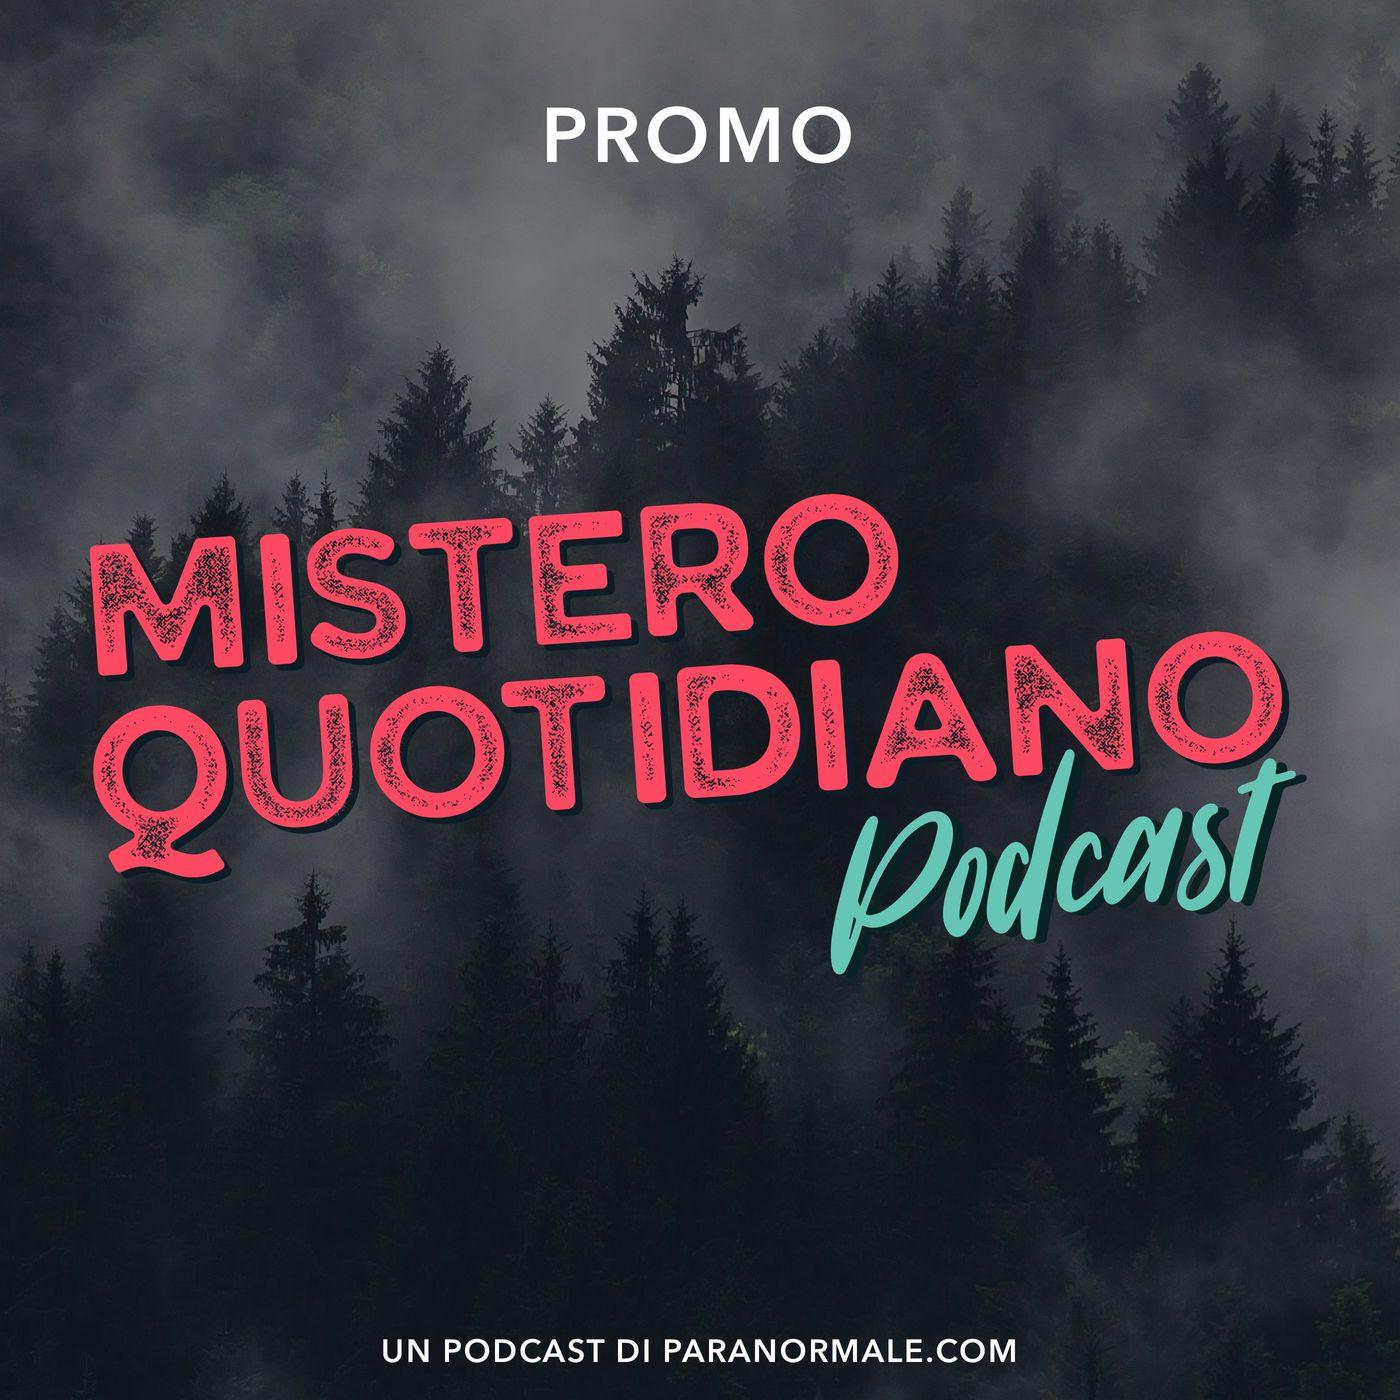 Mistero Quotidiano Podcast